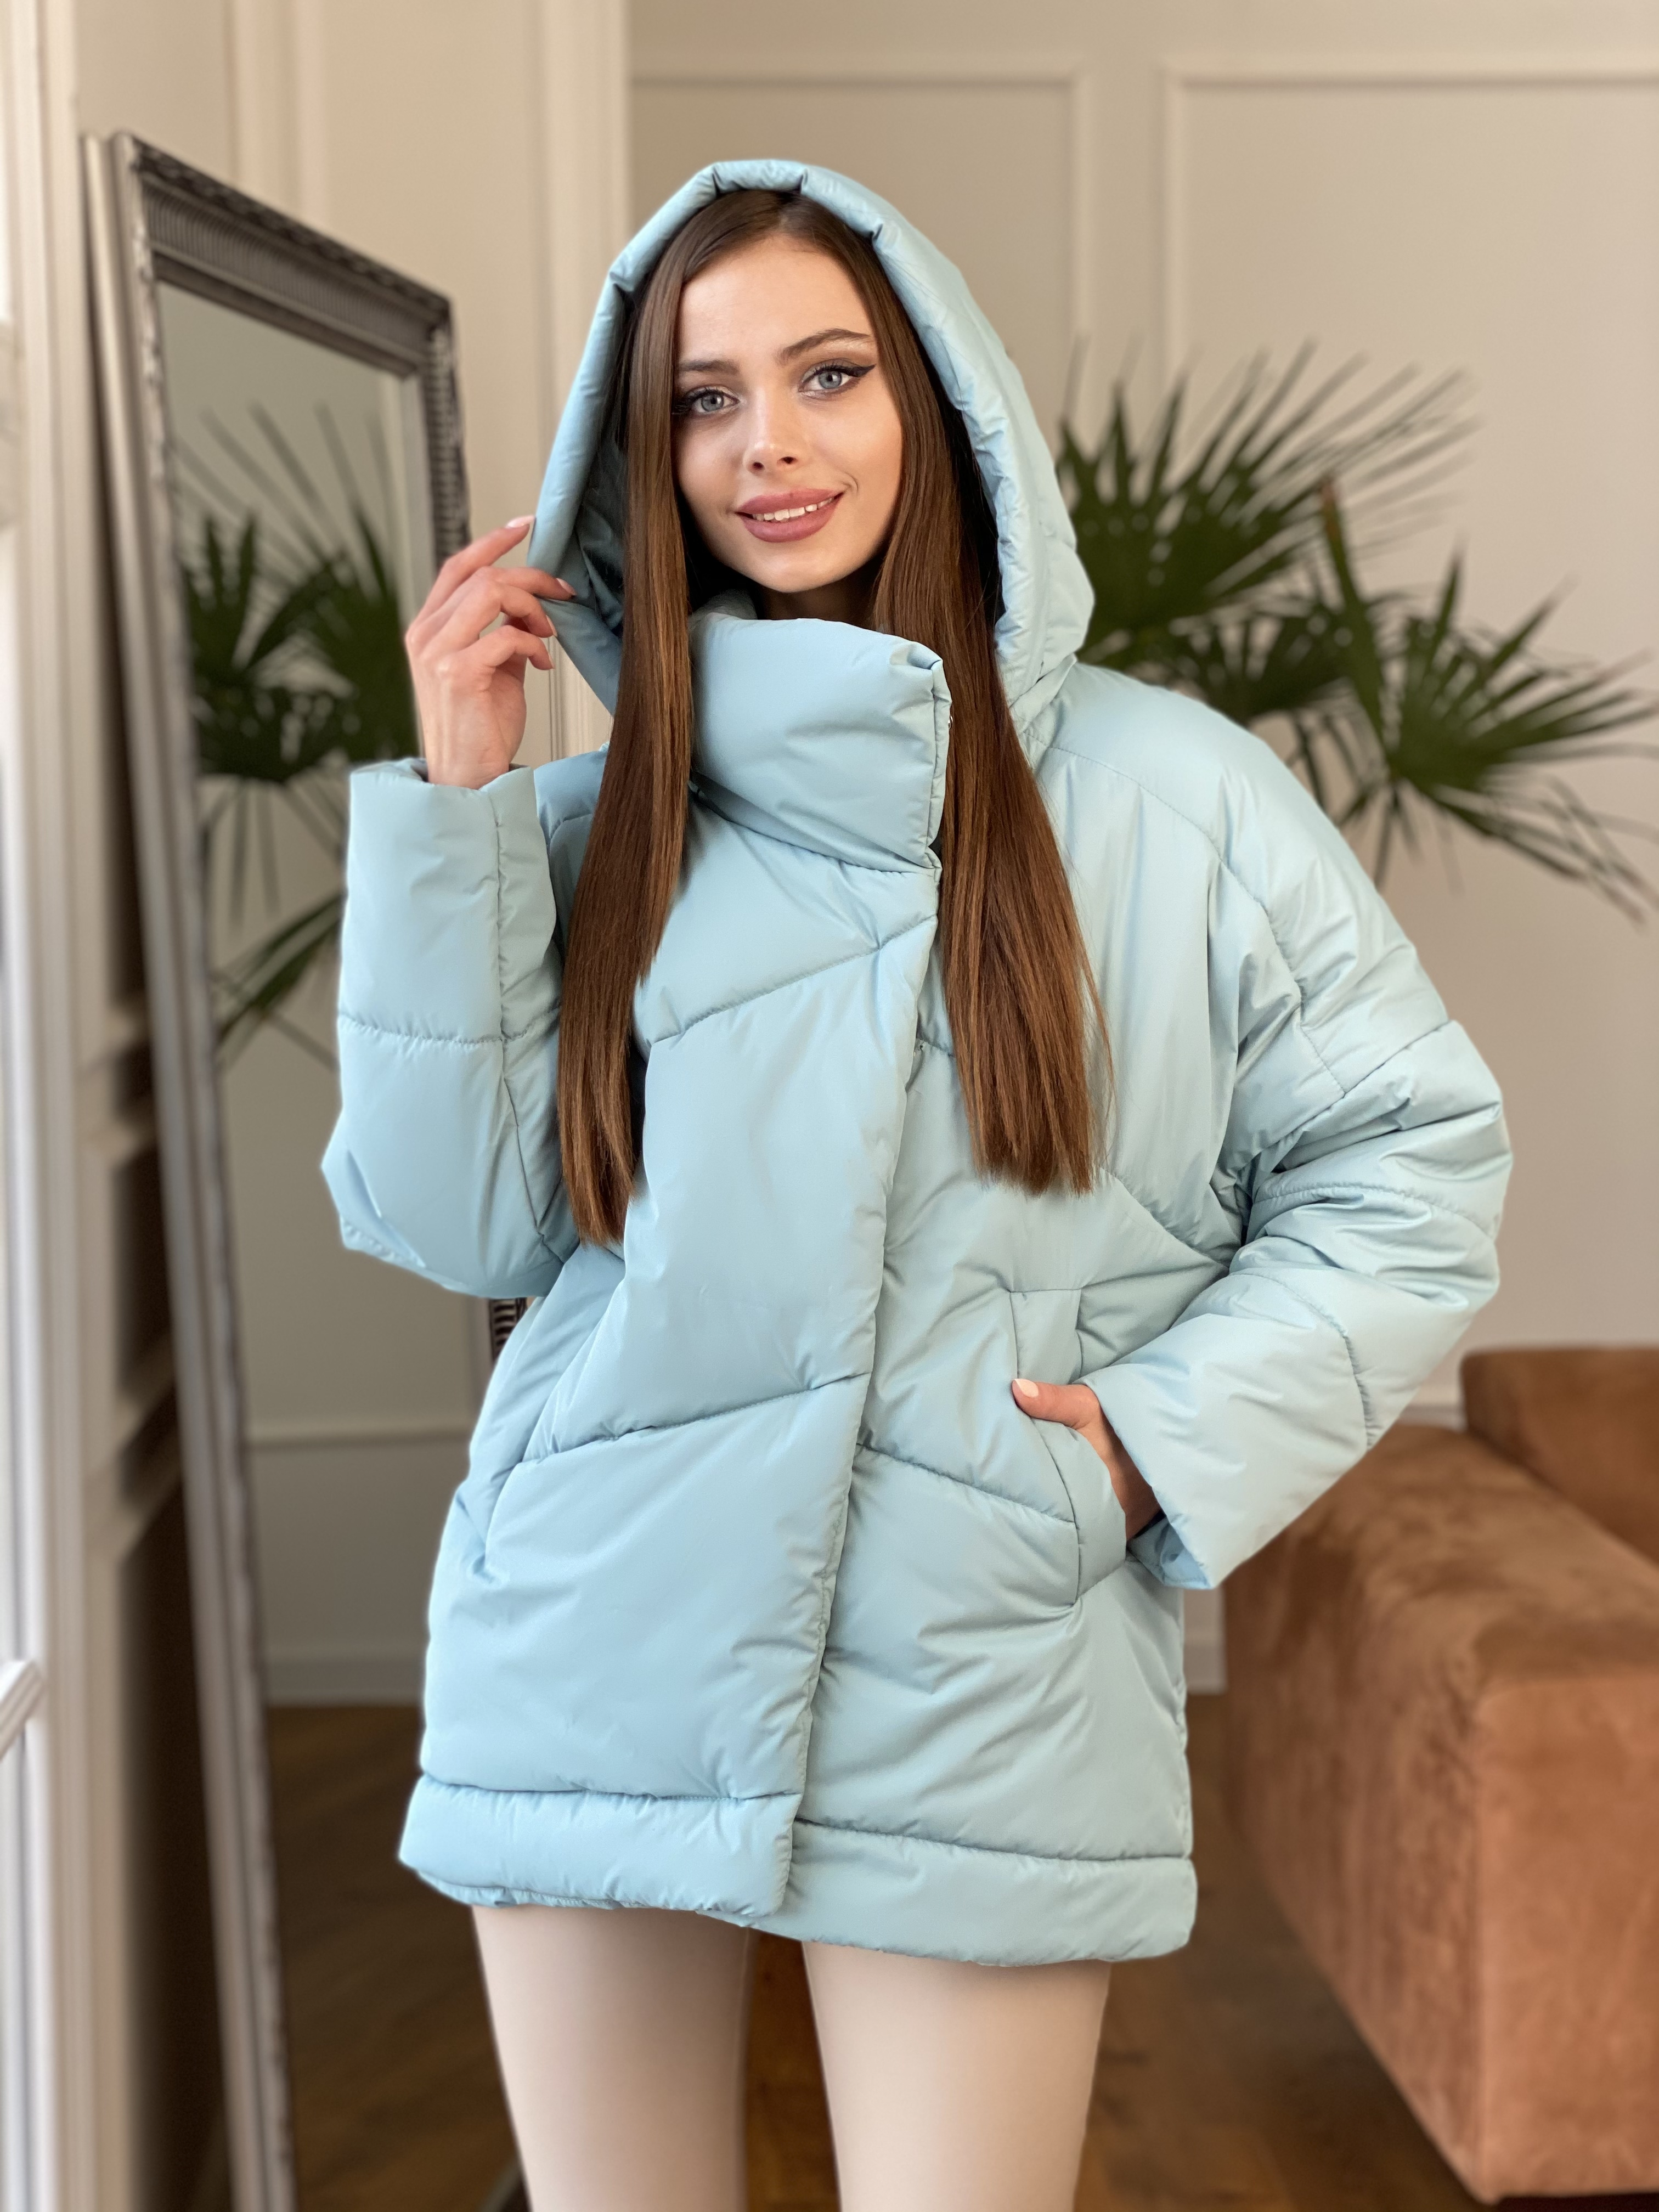 Уно куртка плащевка Ammy 10671 АРТ. 47079 Цвет: Олива - фото 4, интернет магазин tm-modus.ru